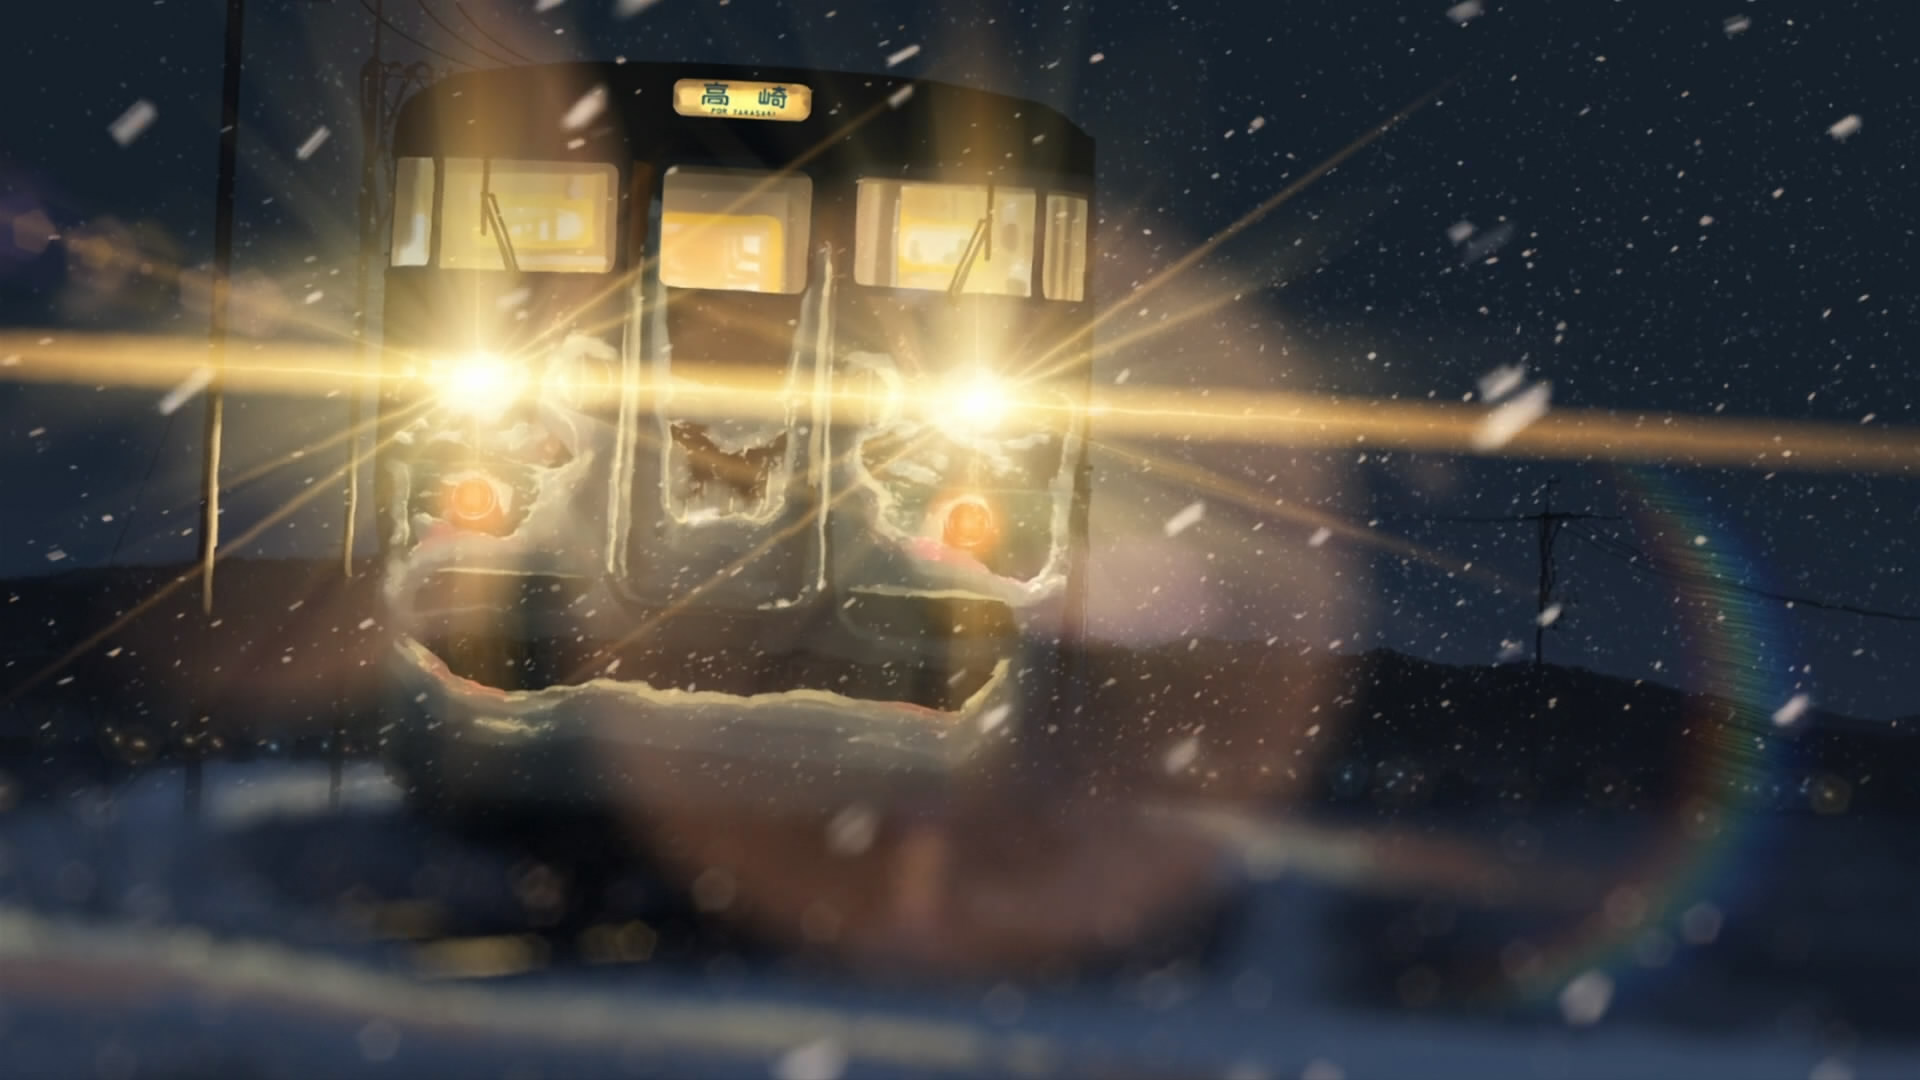 Snow Trains Makoto Shinkai Traffic Lights 5 Centimeters Per